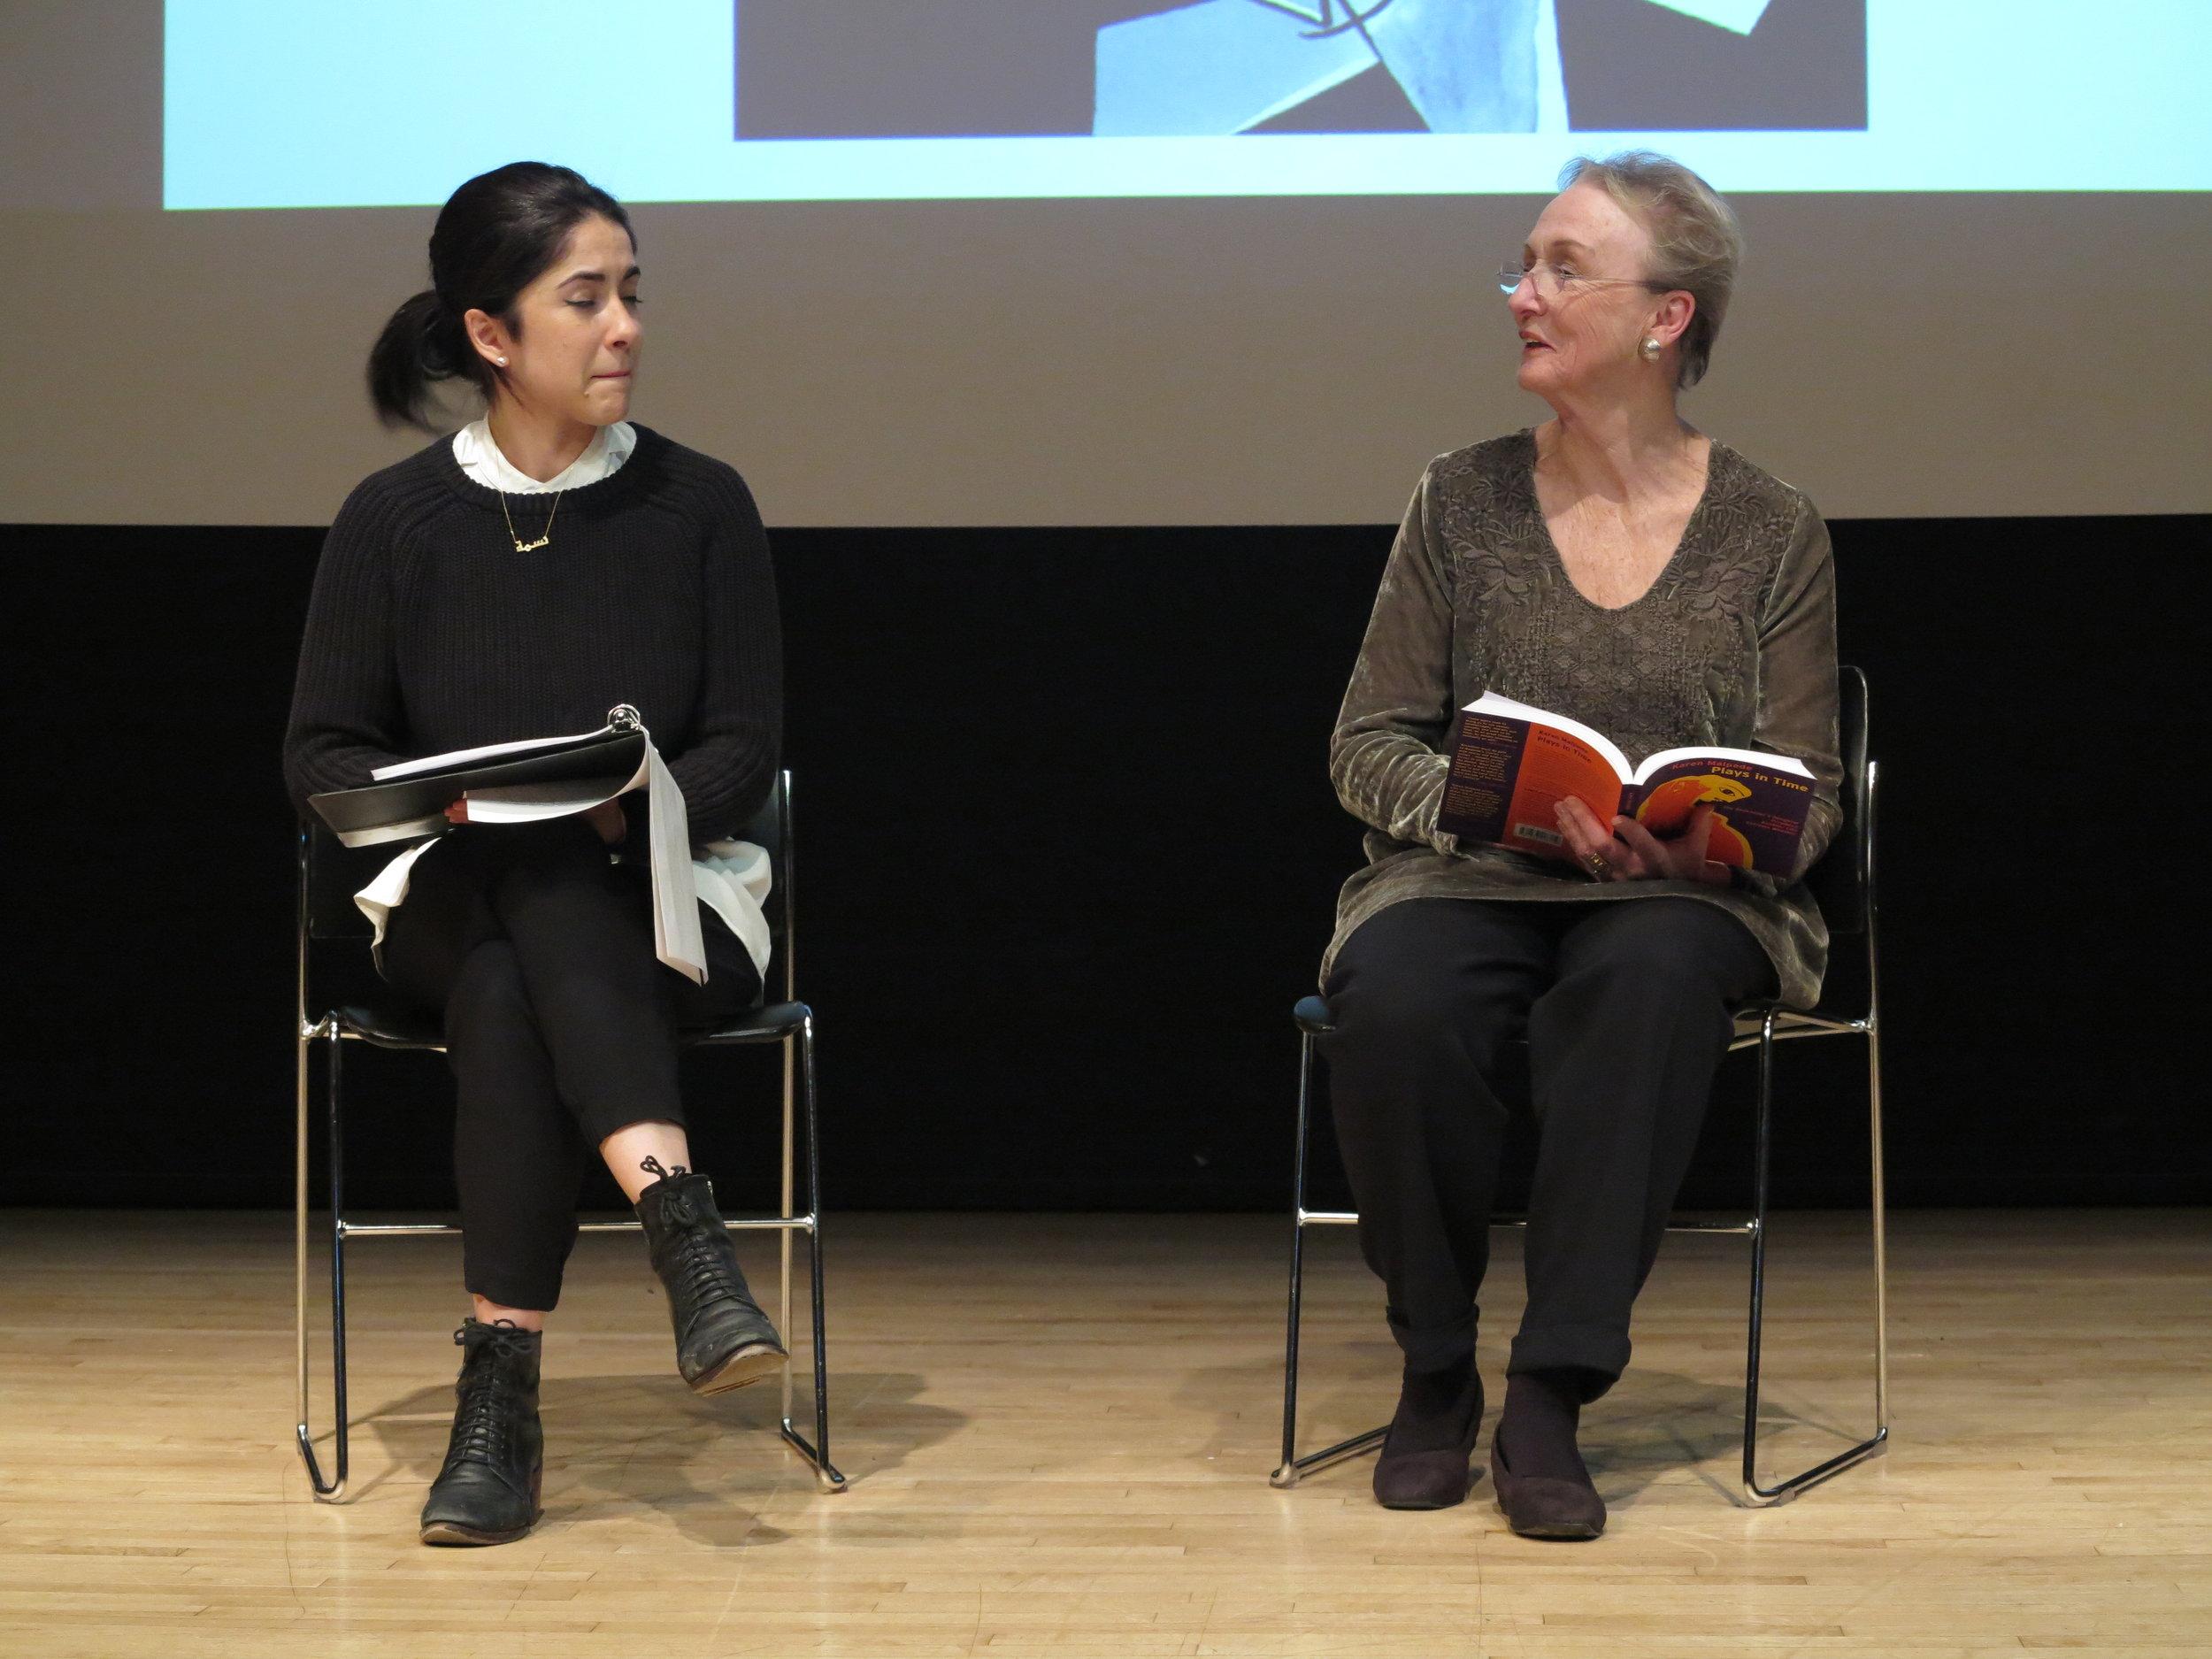 Caitlin Cassidy and Kathleen Chalfant